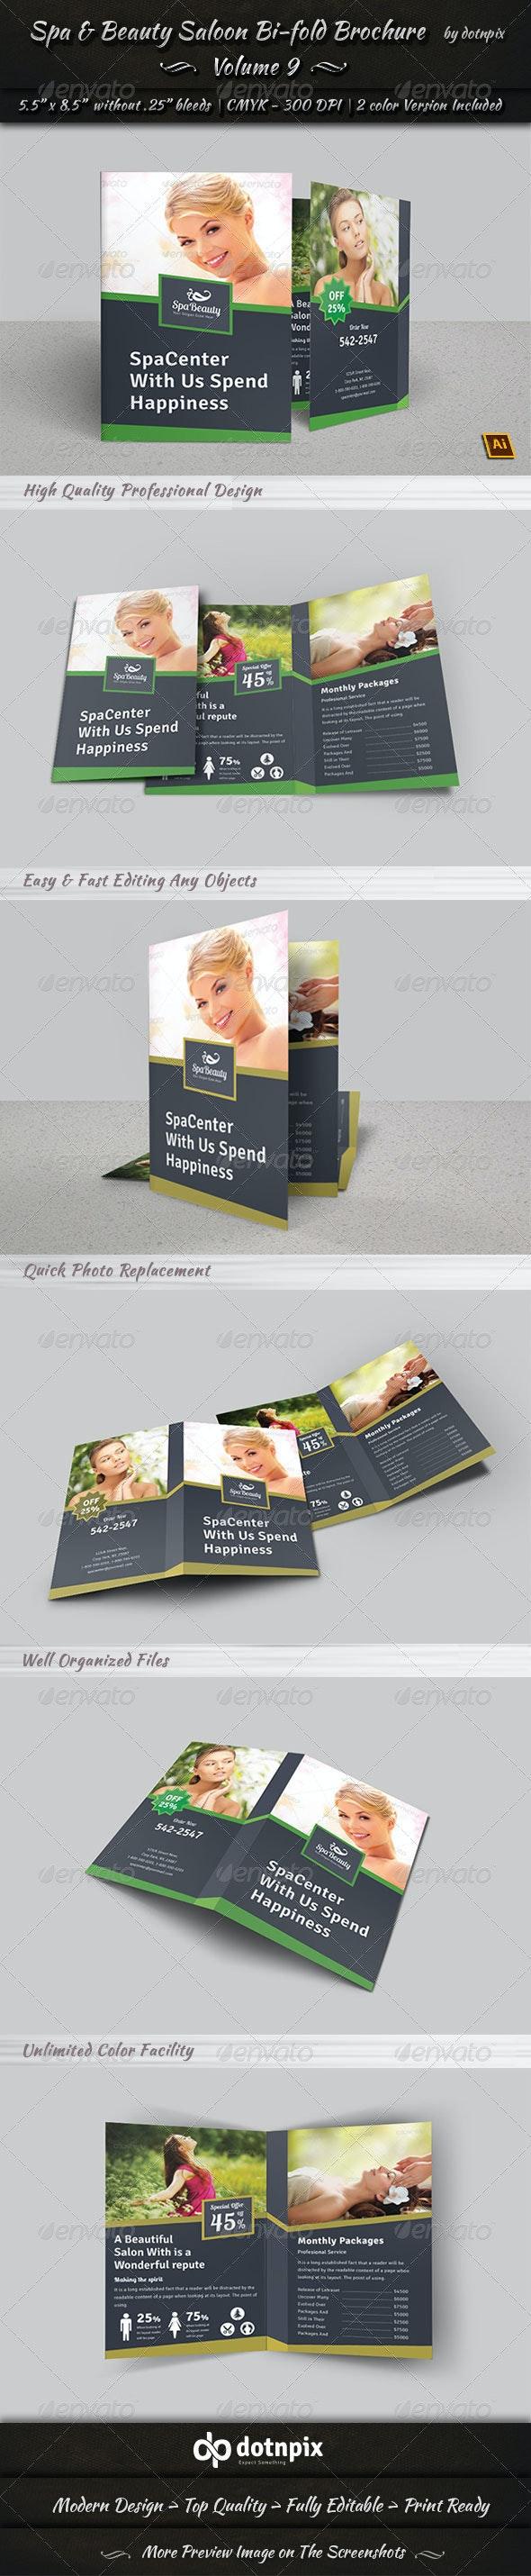 Spa & Beauty Saloon Bi-fold Brochure | Volume 9 - Corporate Brochures